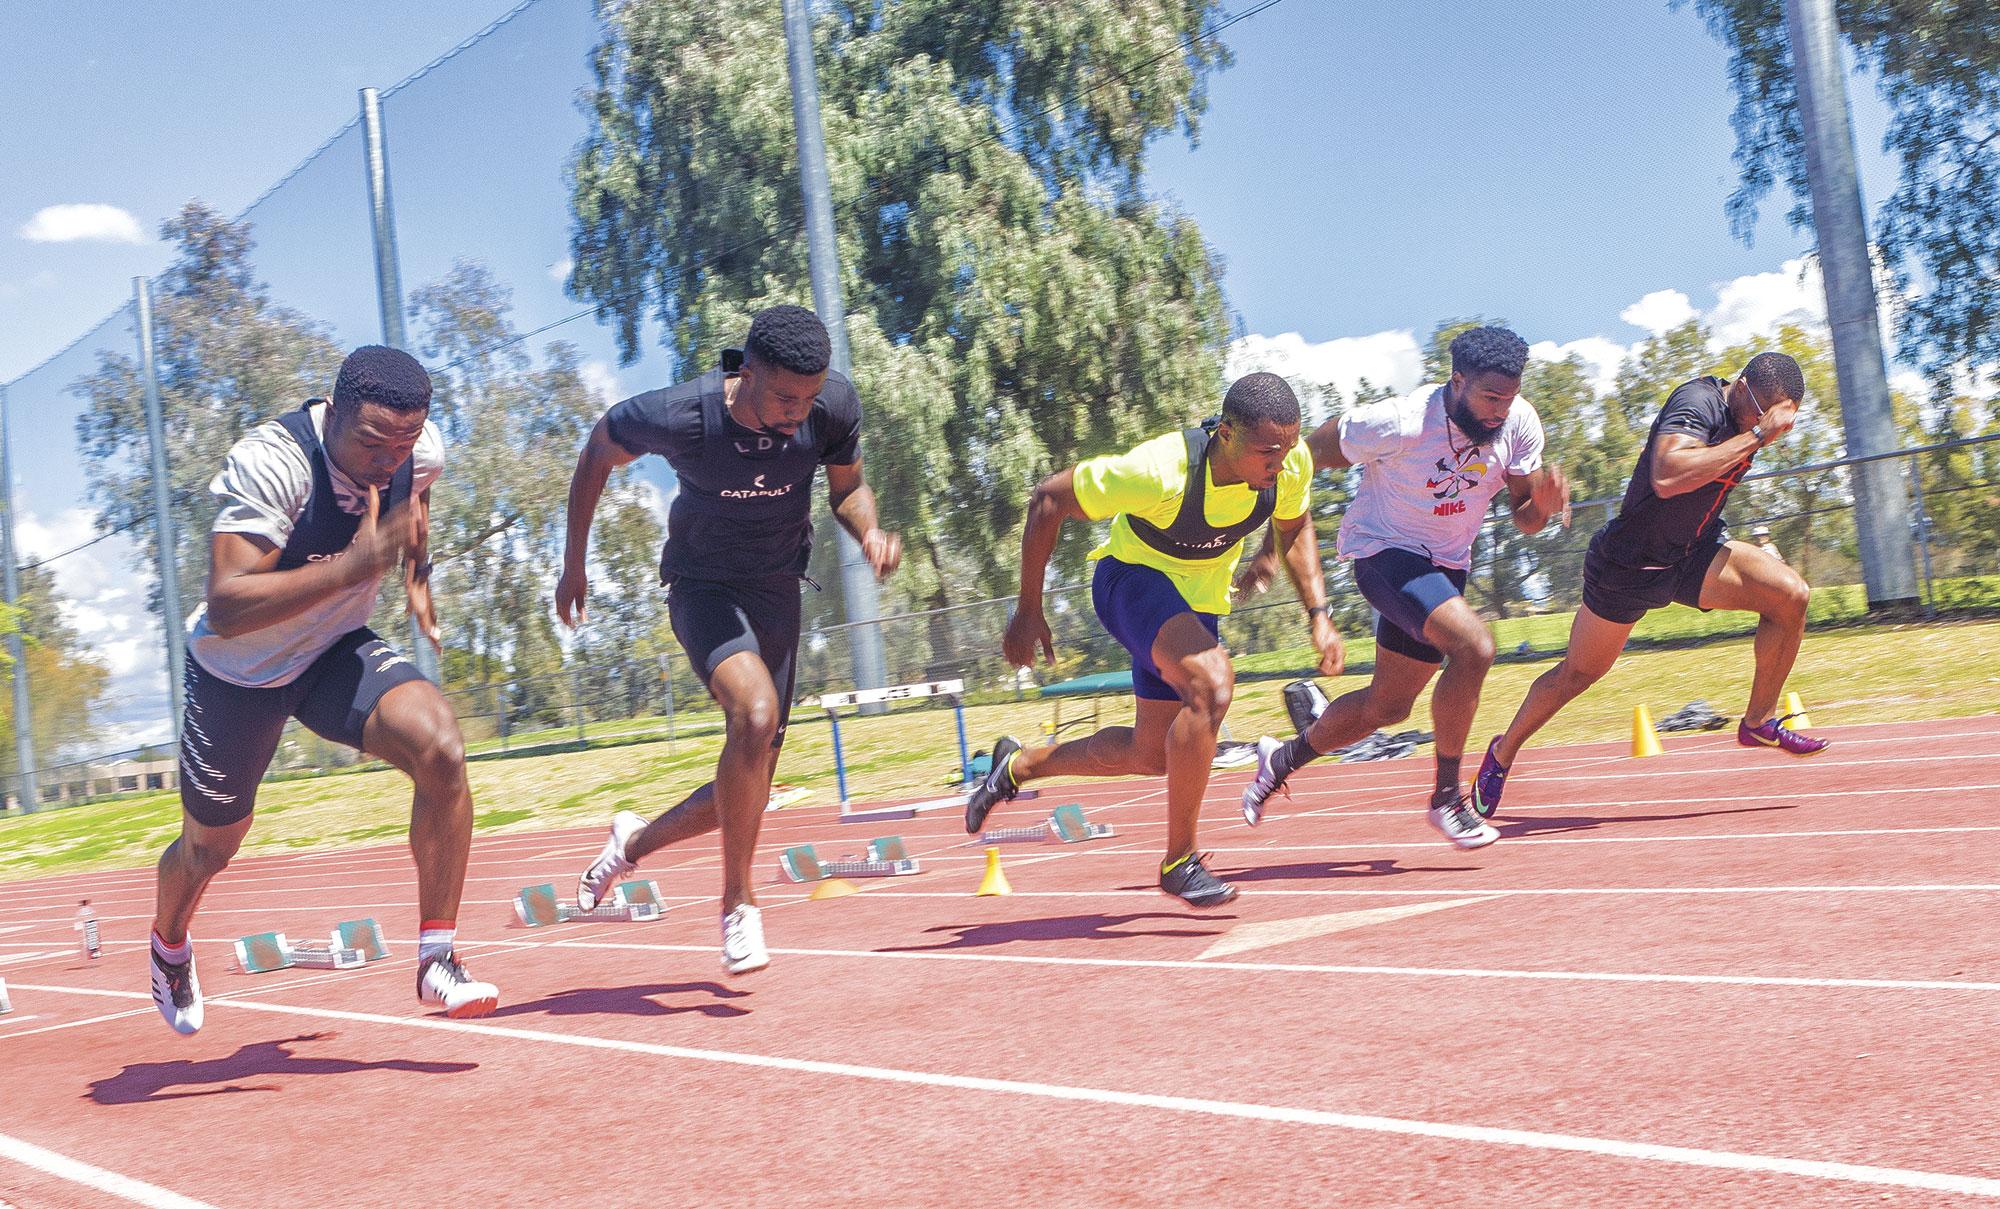 Sprinters left to right: Dushos Itsekiri, Anaso Jobodwana, CJ Ujah, Ameer Webb, Chris Royster; photo by James Patrick